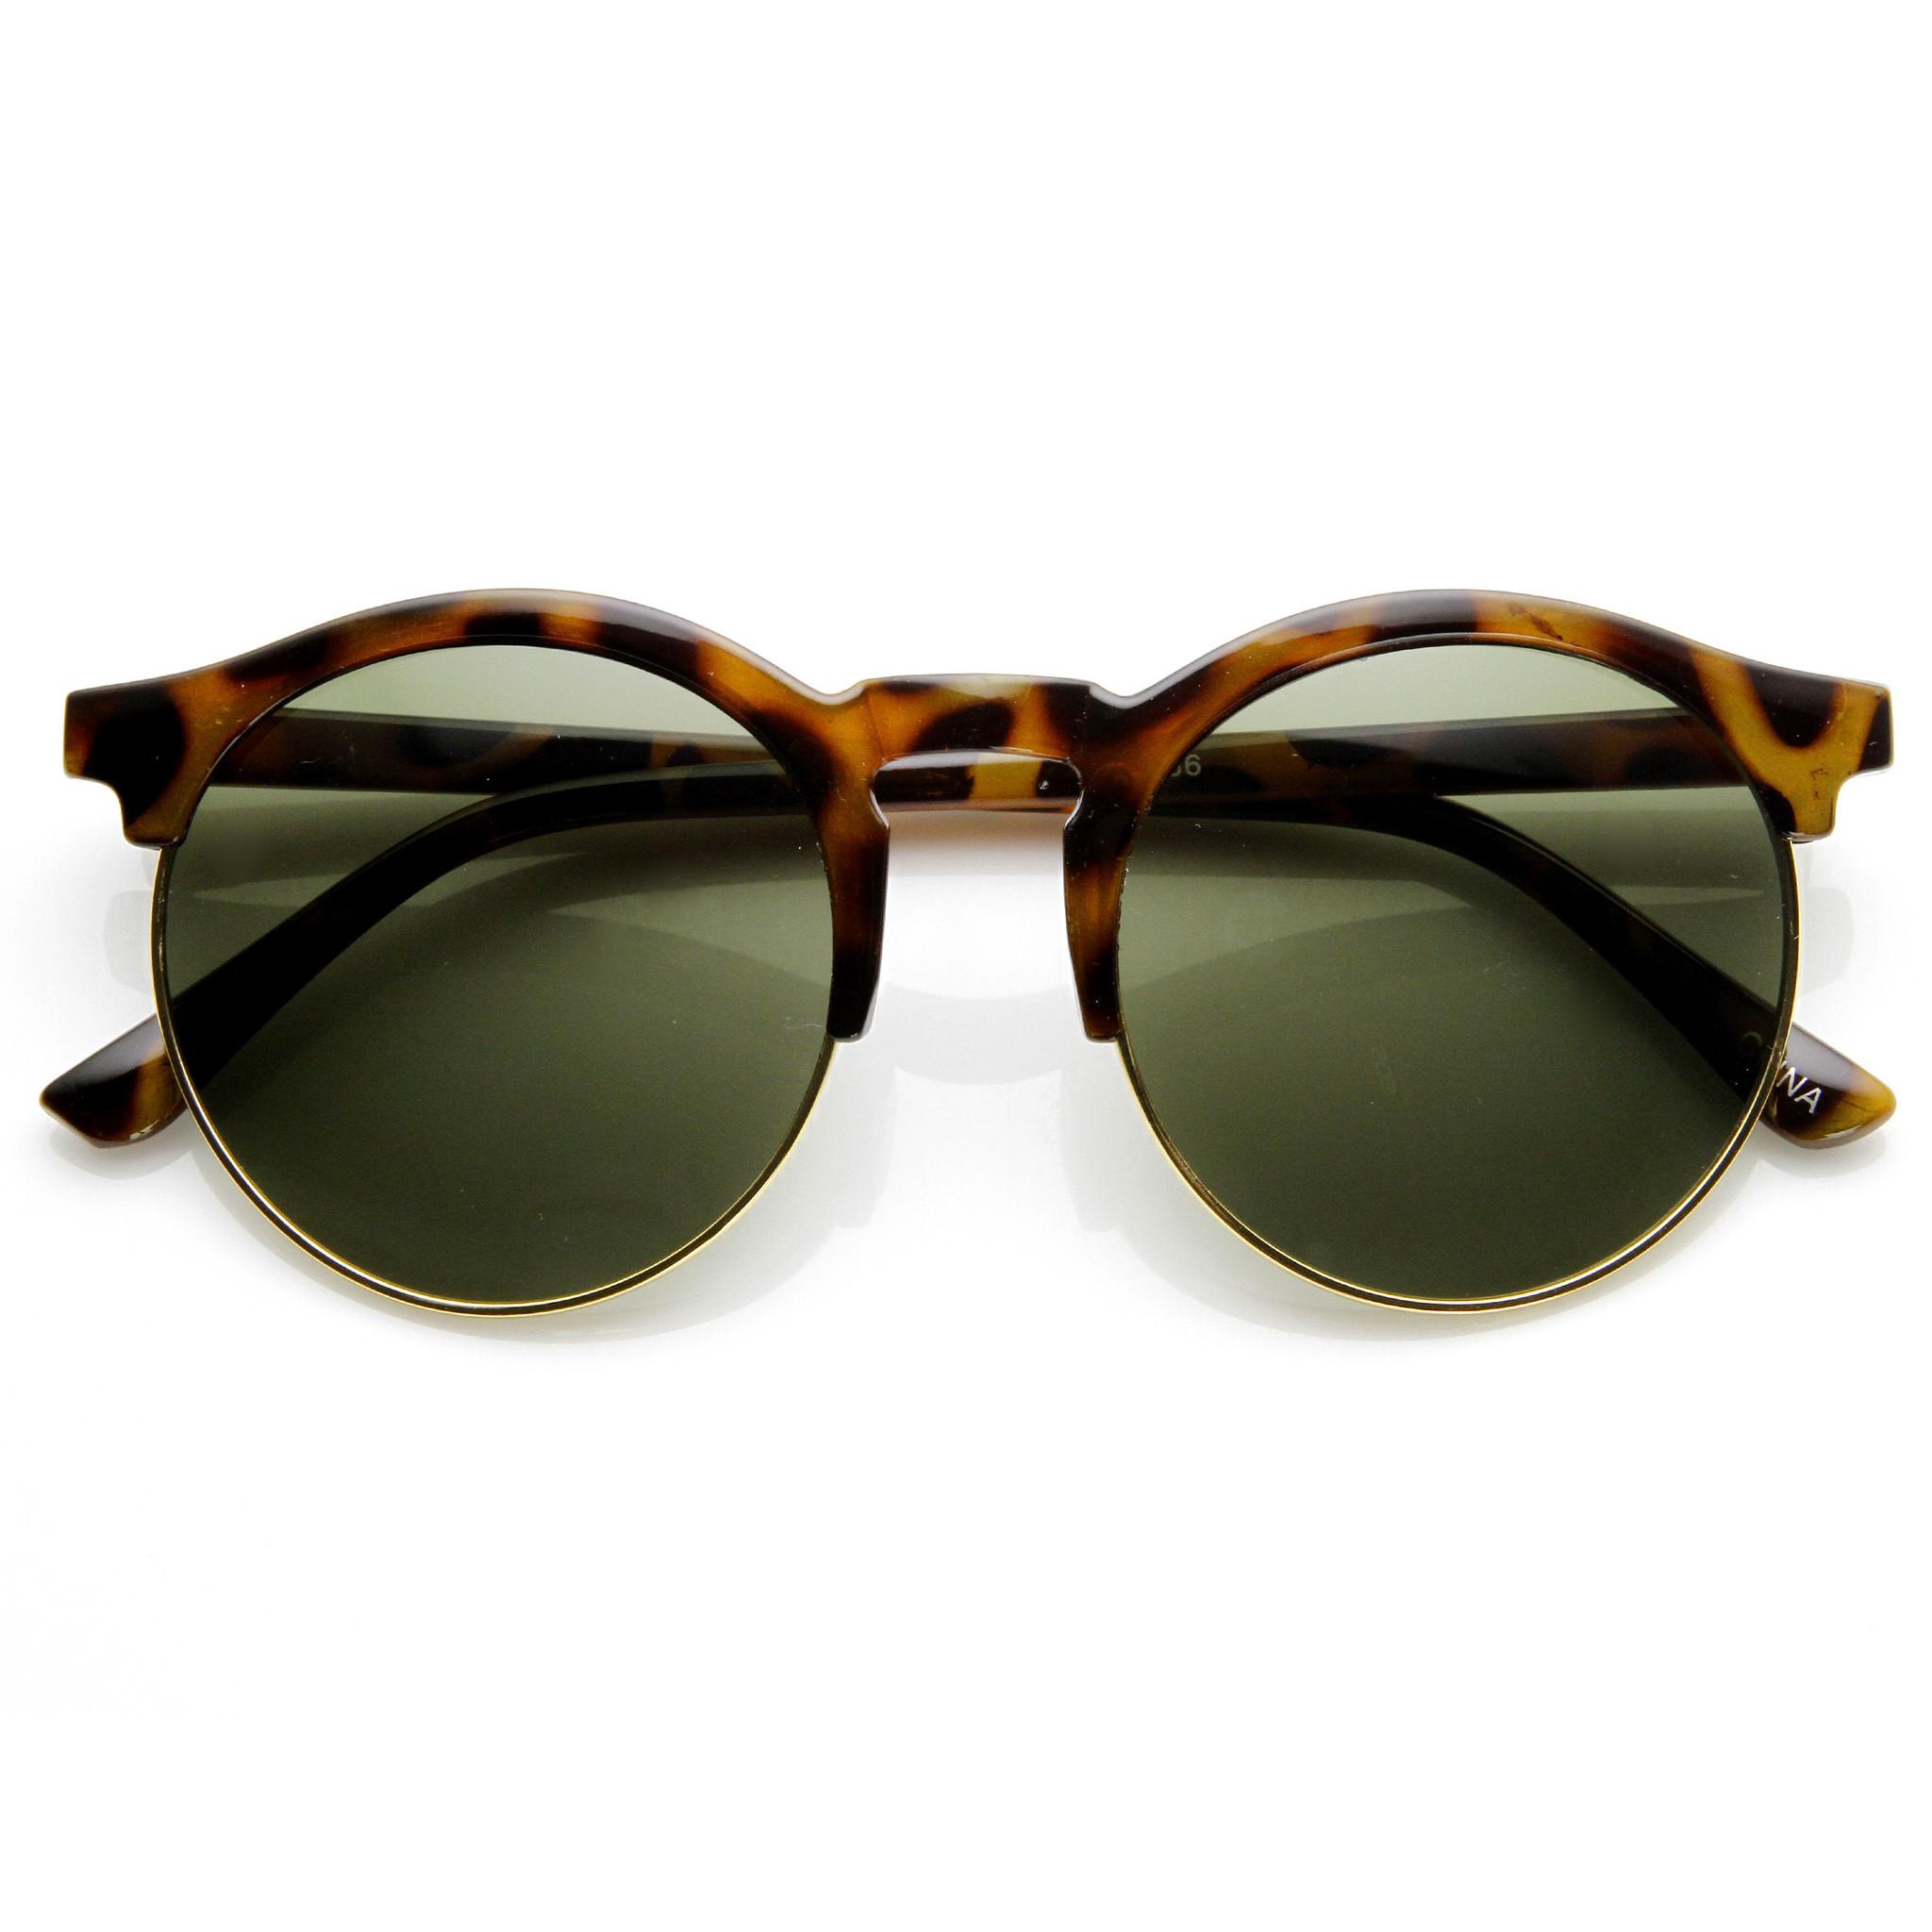 Oversize vintage designer inspired round indie half frame sunglasses 9173